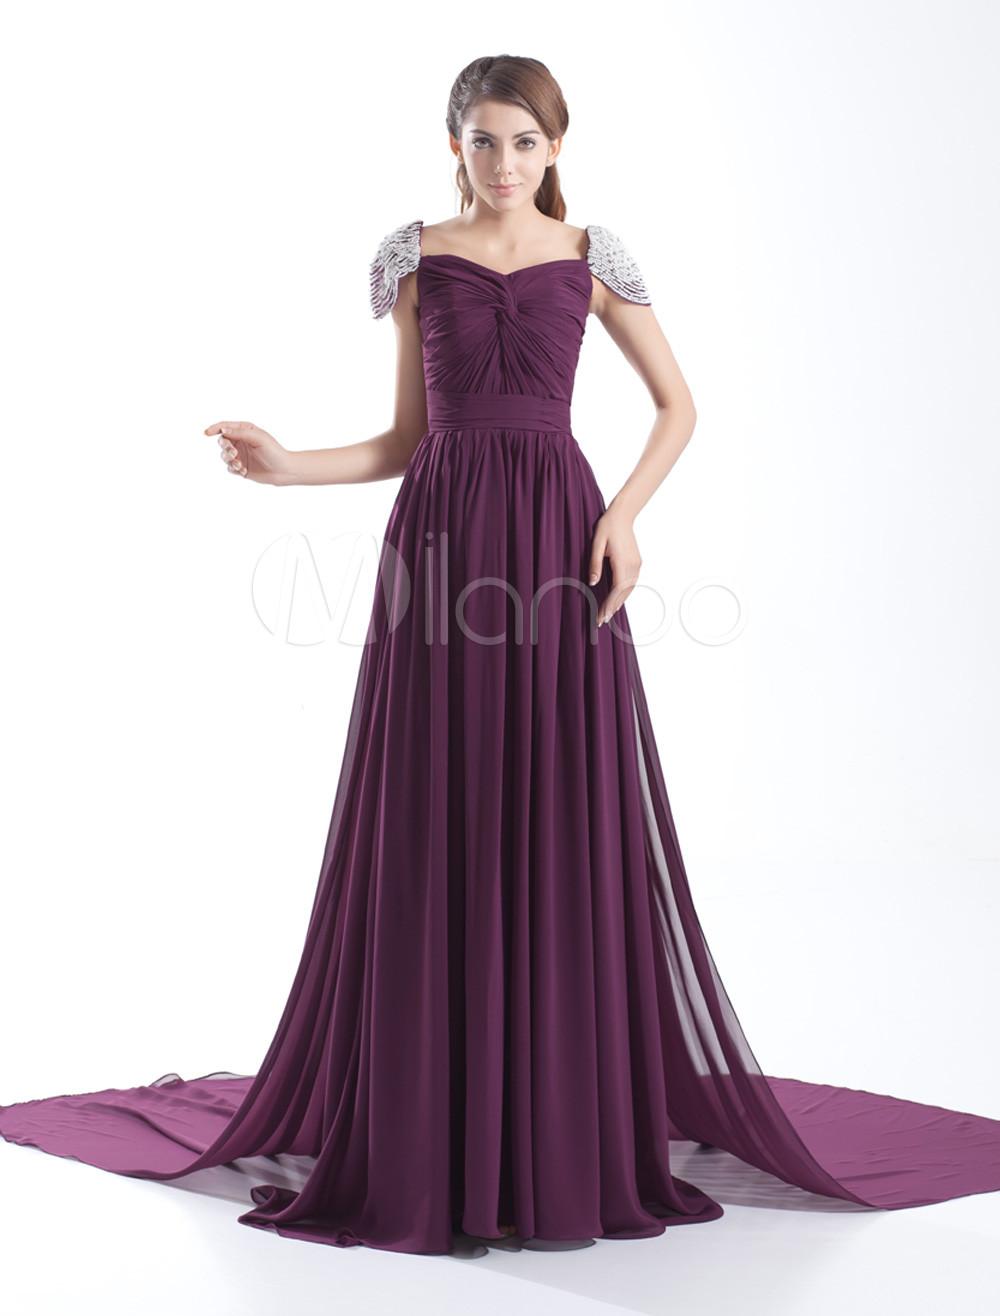 Grace Grape Chiffon Twisted Square Neck Women's Evening Dress (Wedding Evening Dresses) photo